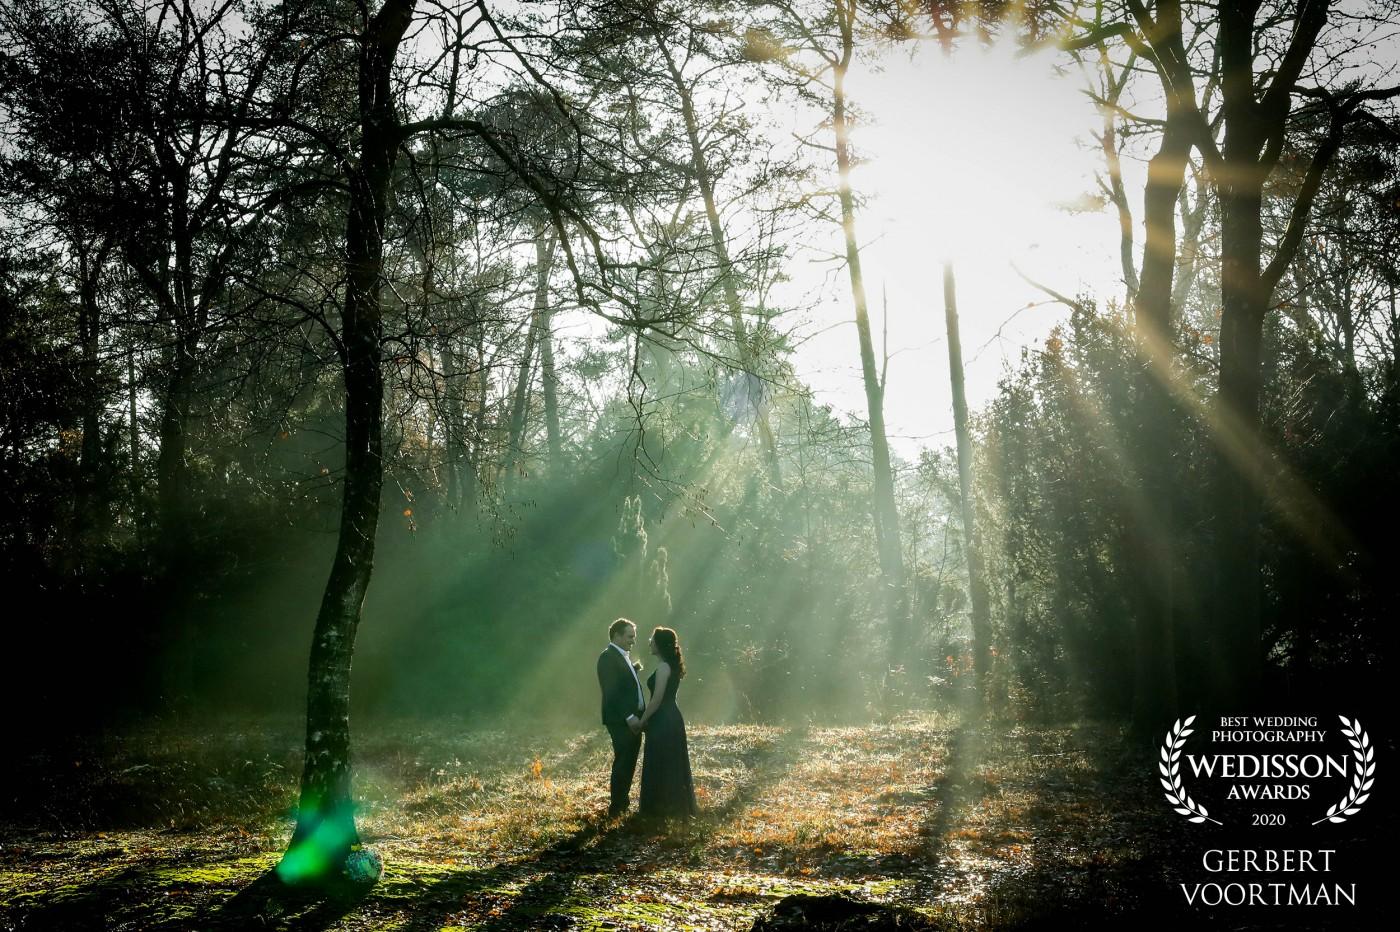 Best wedding photography Wedisson awards 2020